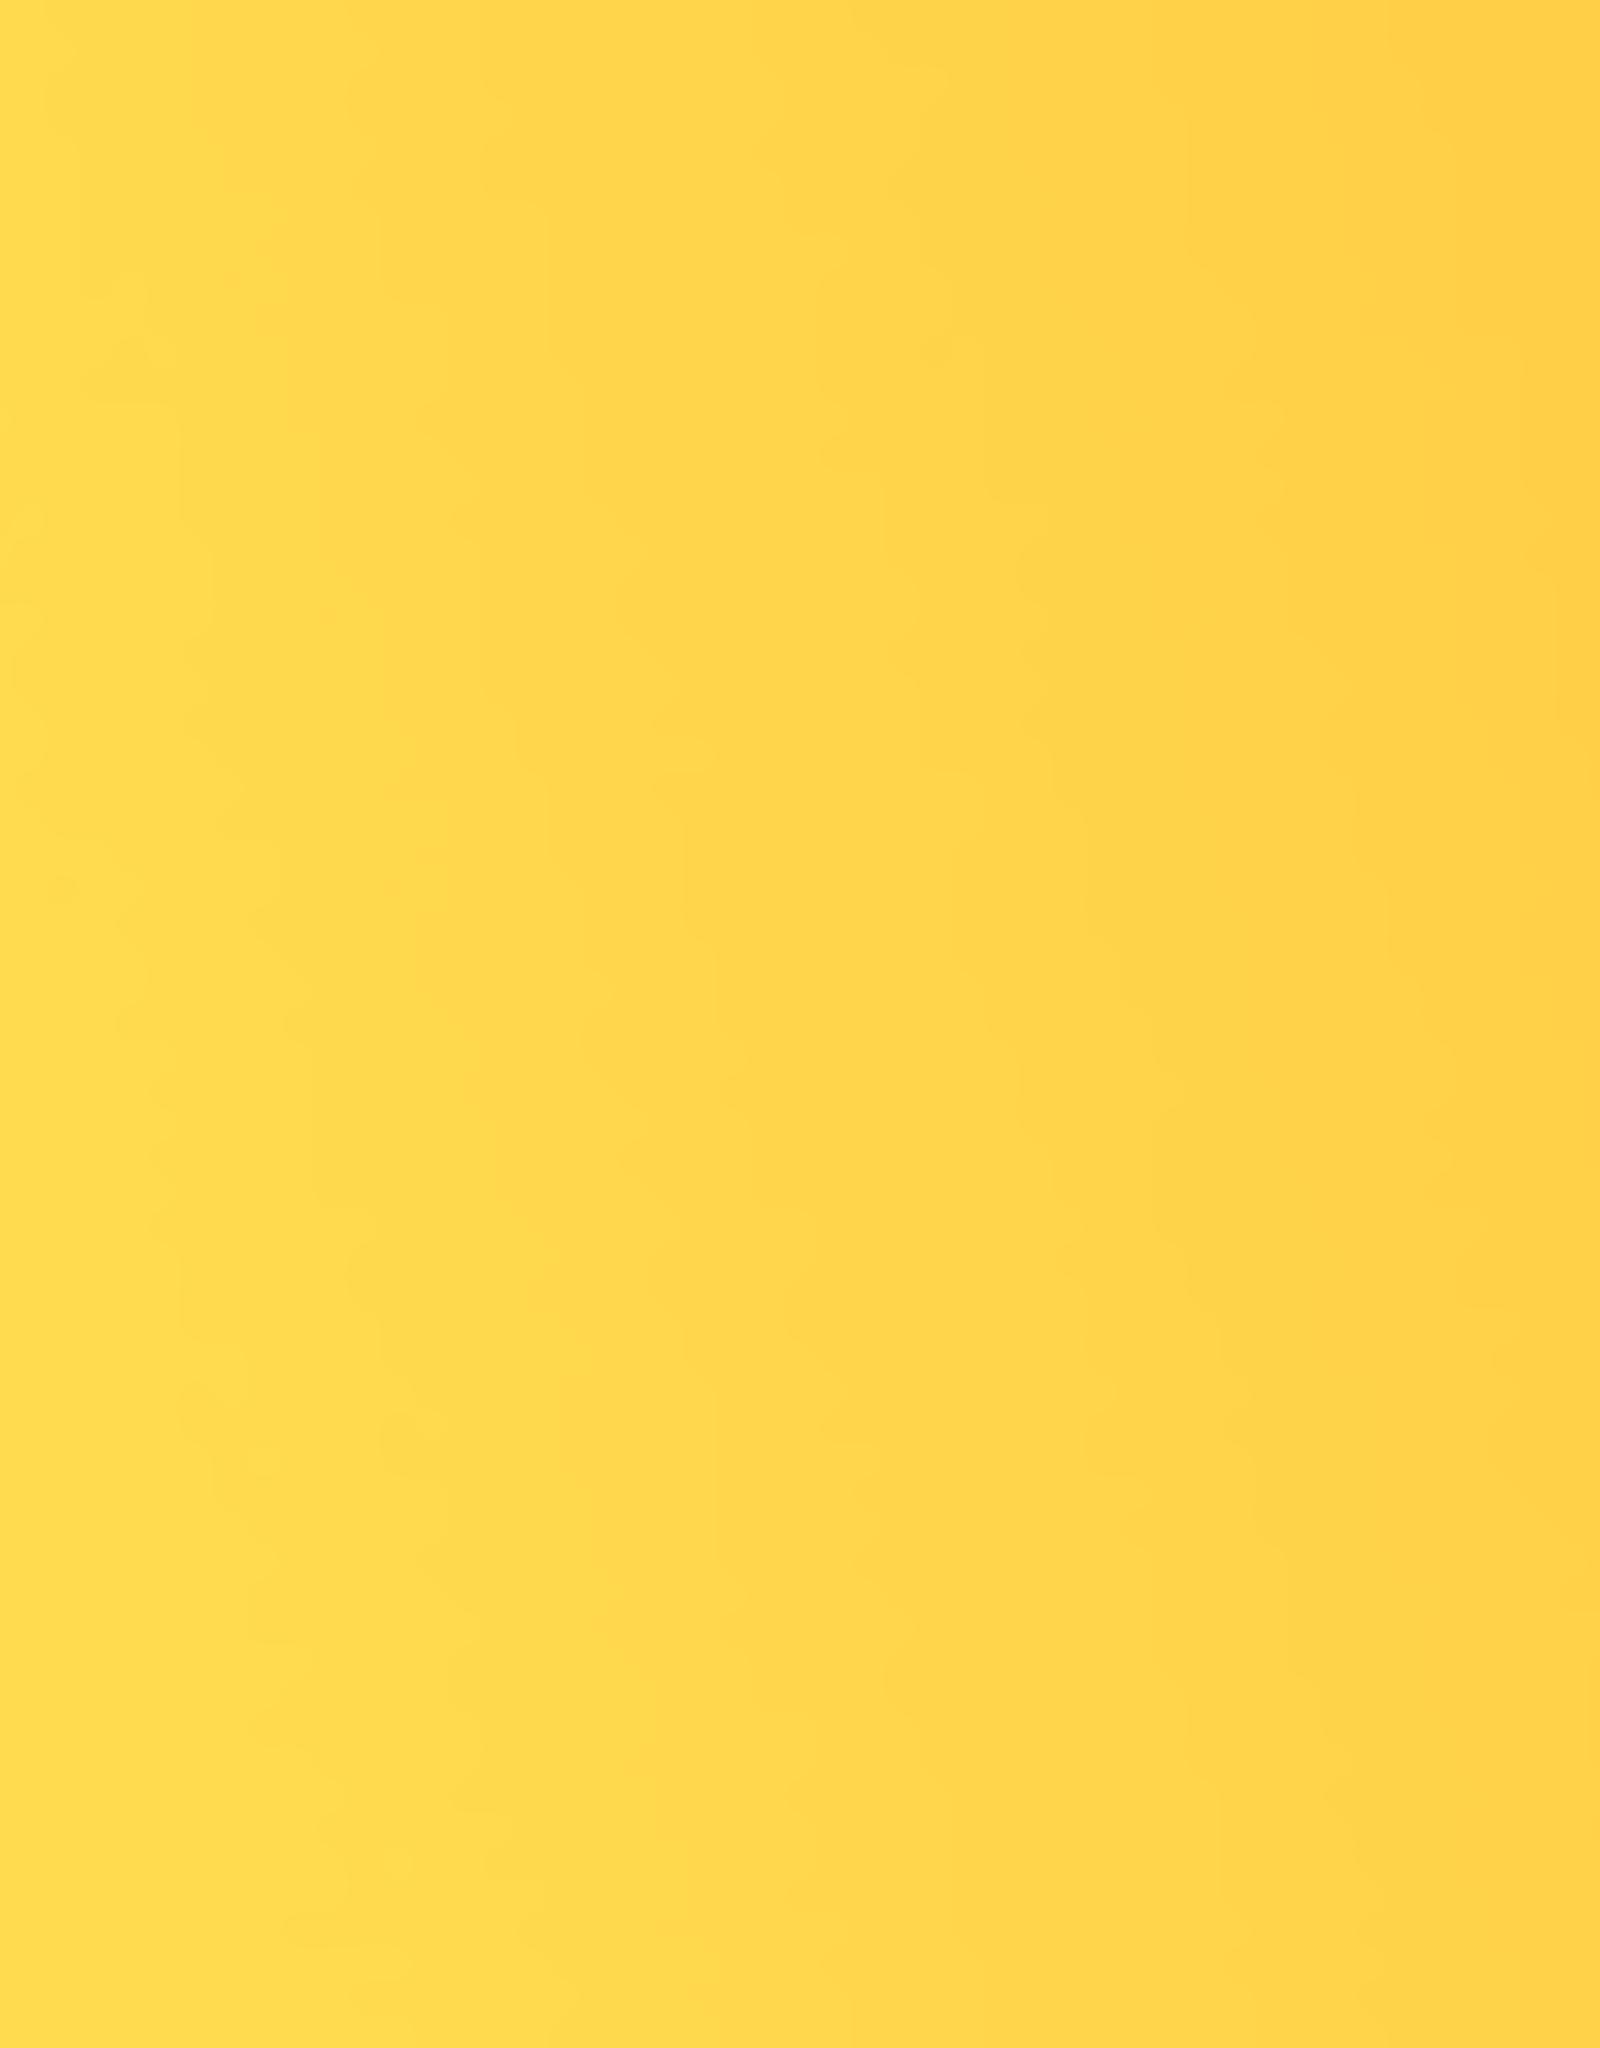 Winsor & Newton Artisan Water Mixable Oil Paint, Cadmium Yellow Light, 37ml